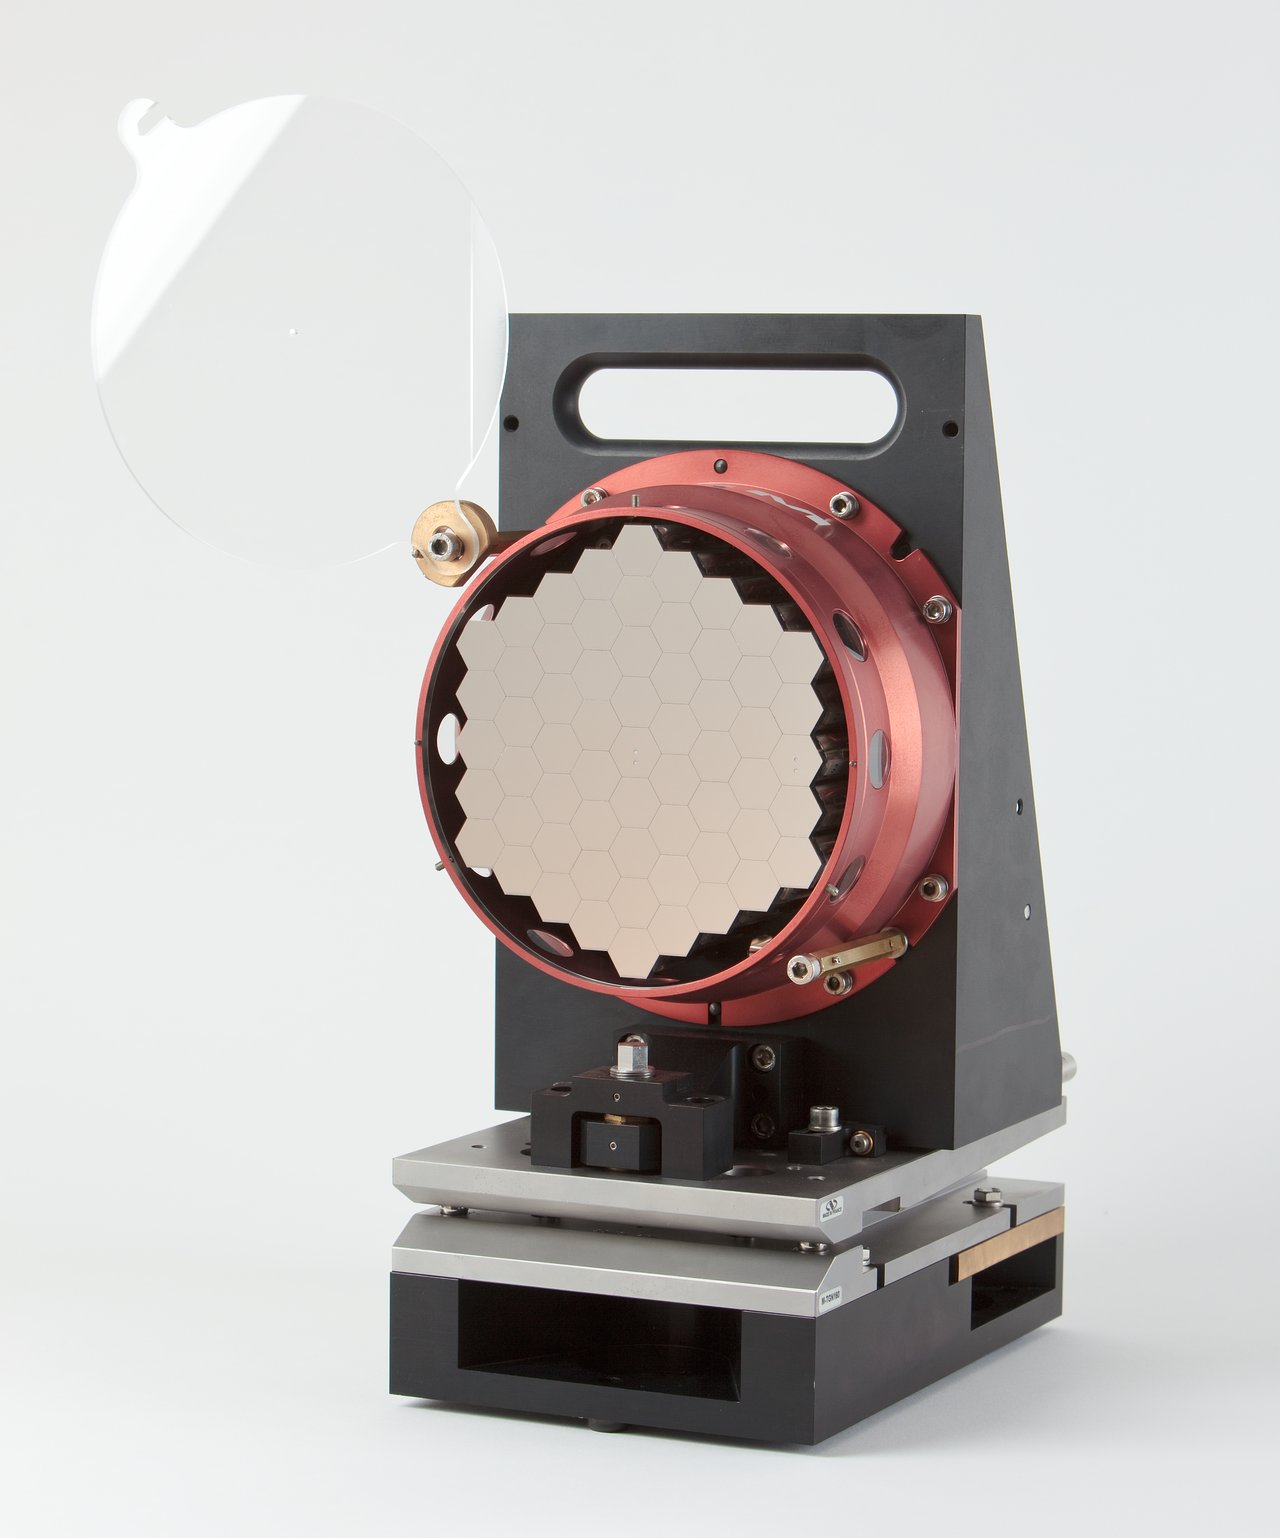 E-ELT scaled segmented mirror